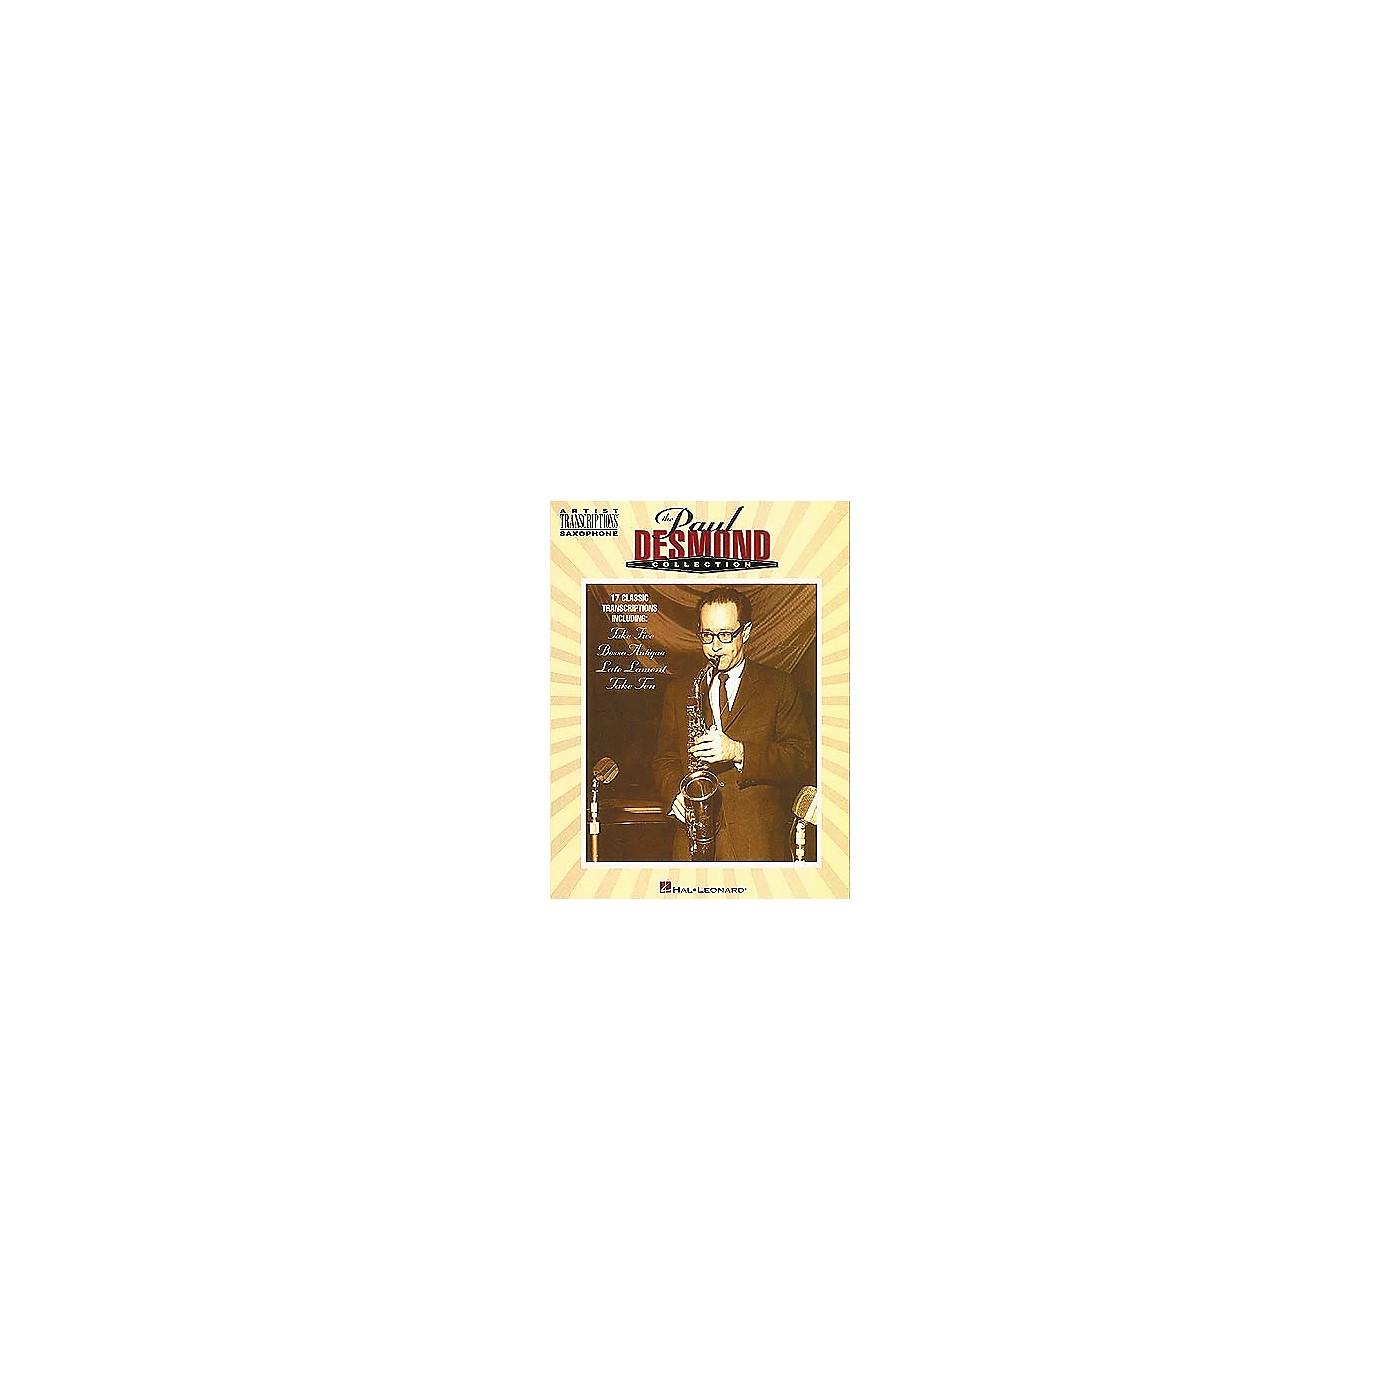 Hal Leonard The Paul Desmond Collection thumbnail